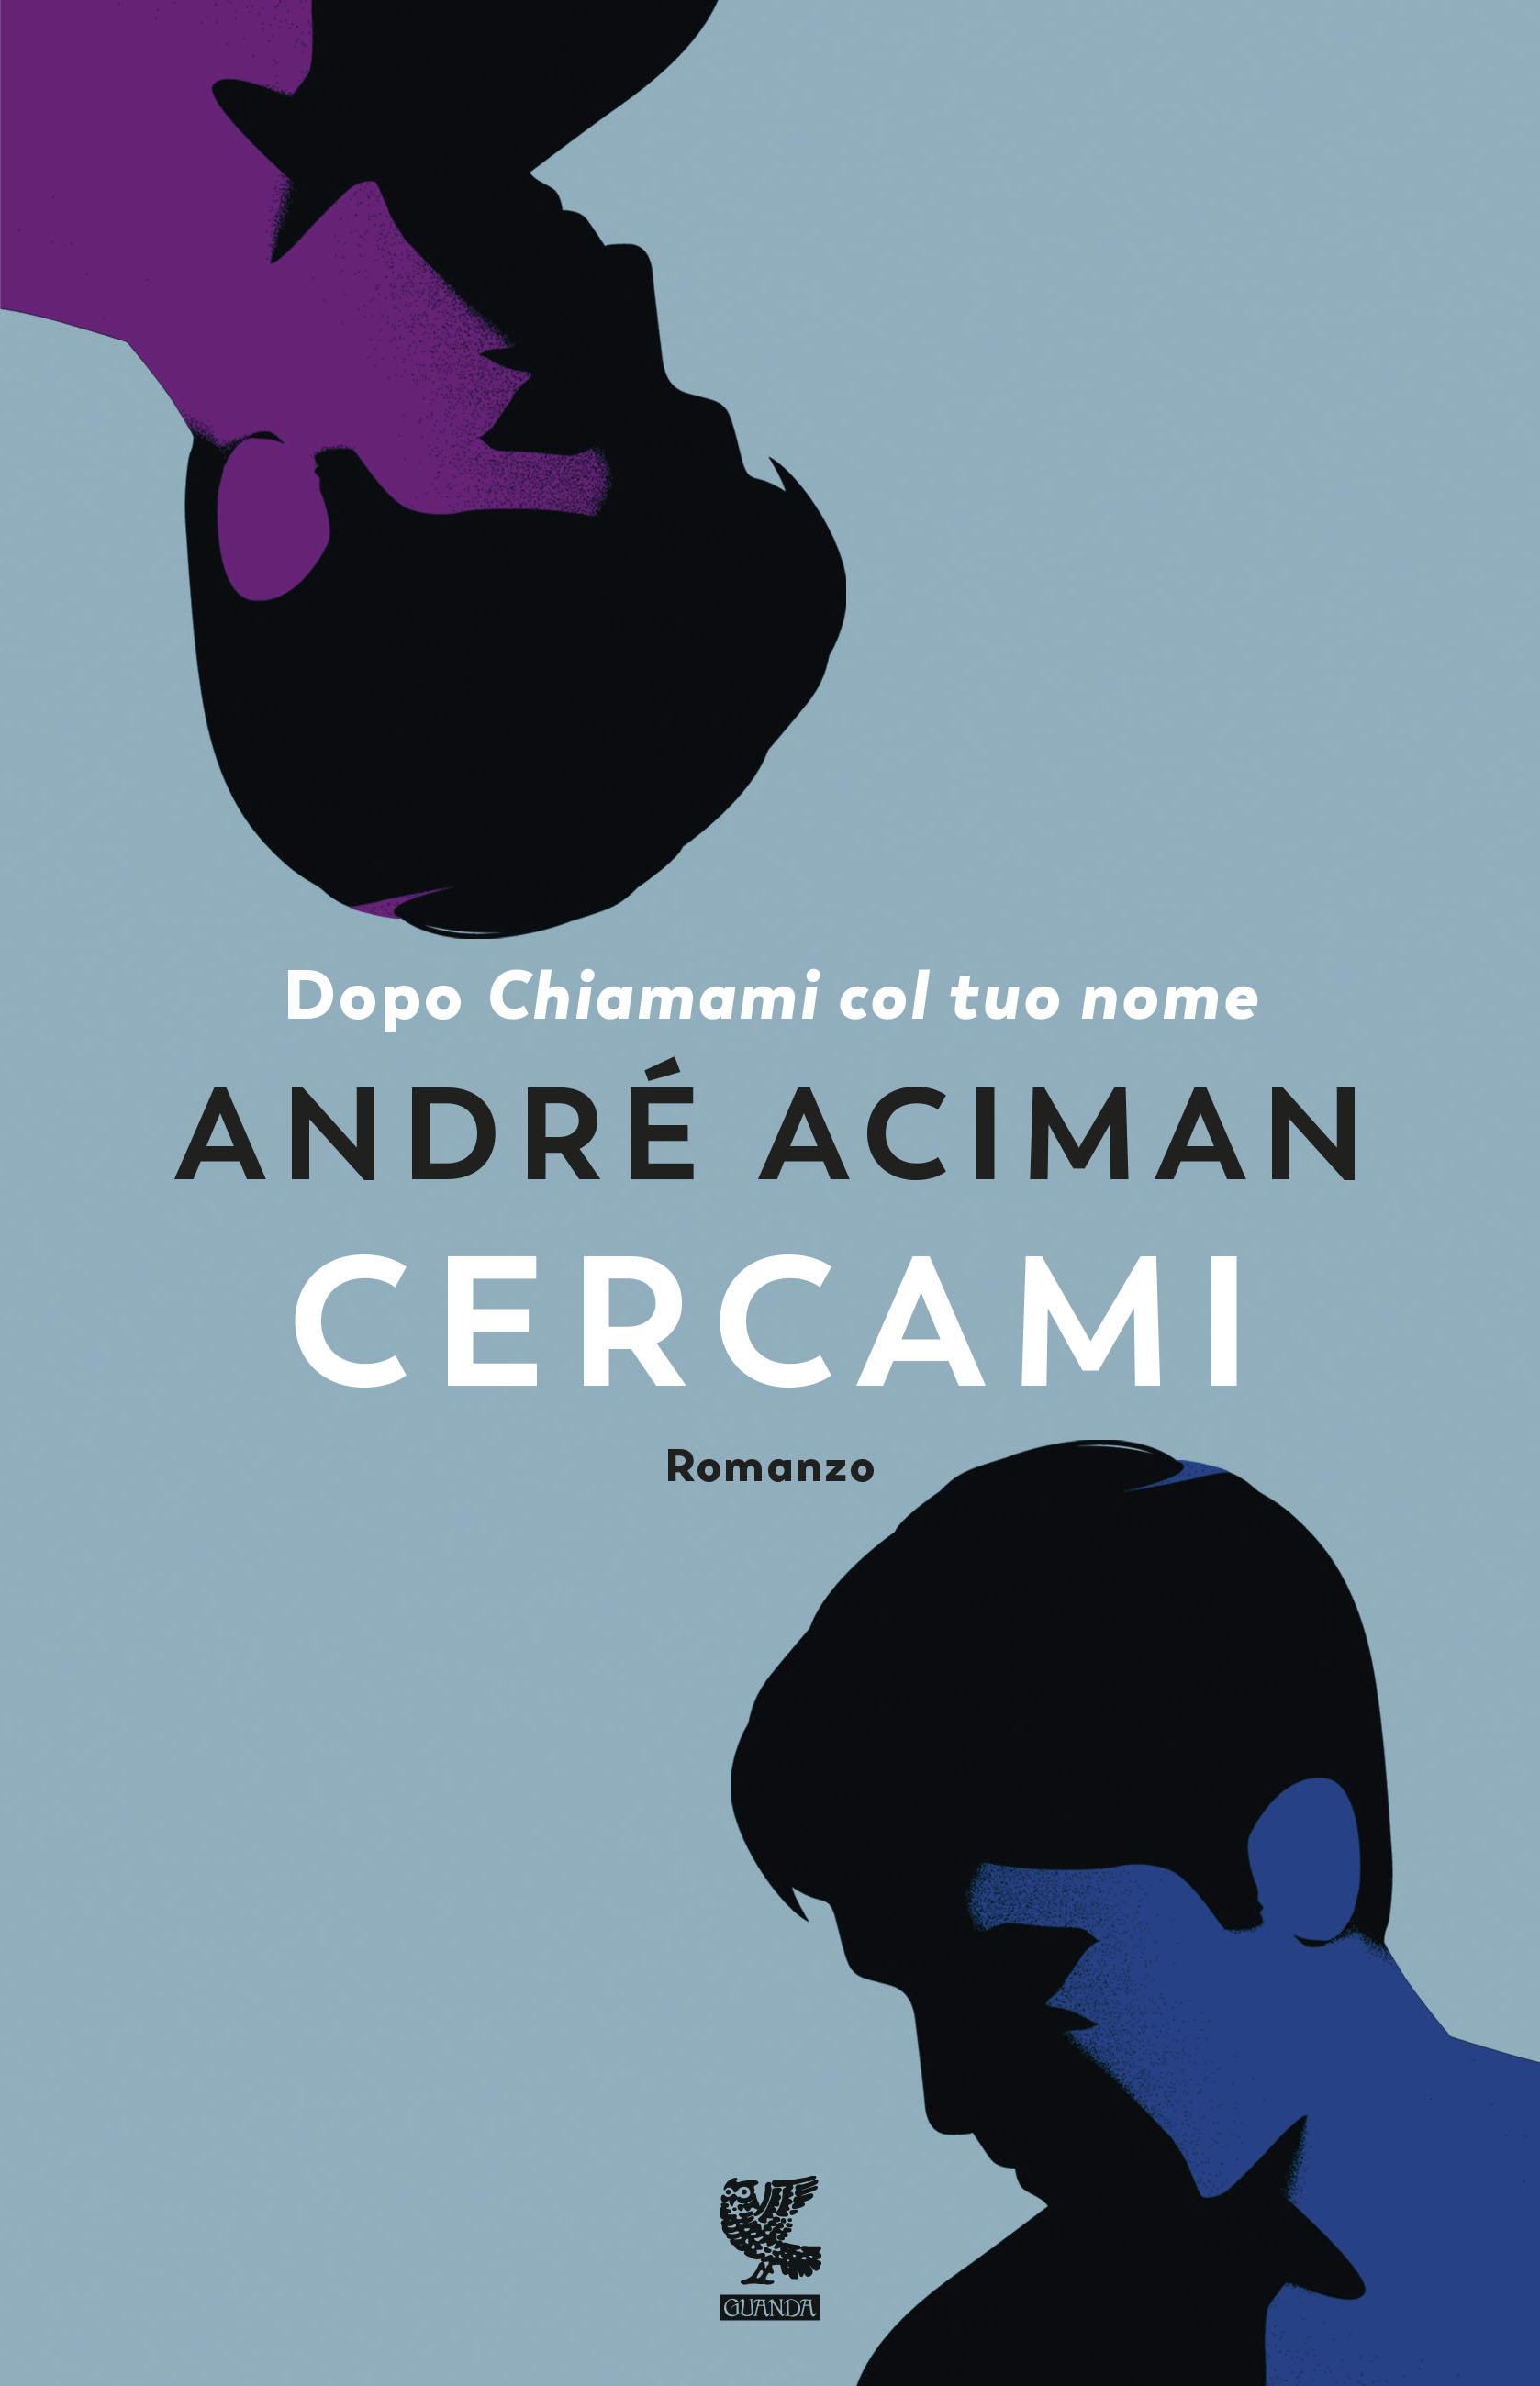 andre-aciman-cercami-9788823522909-4